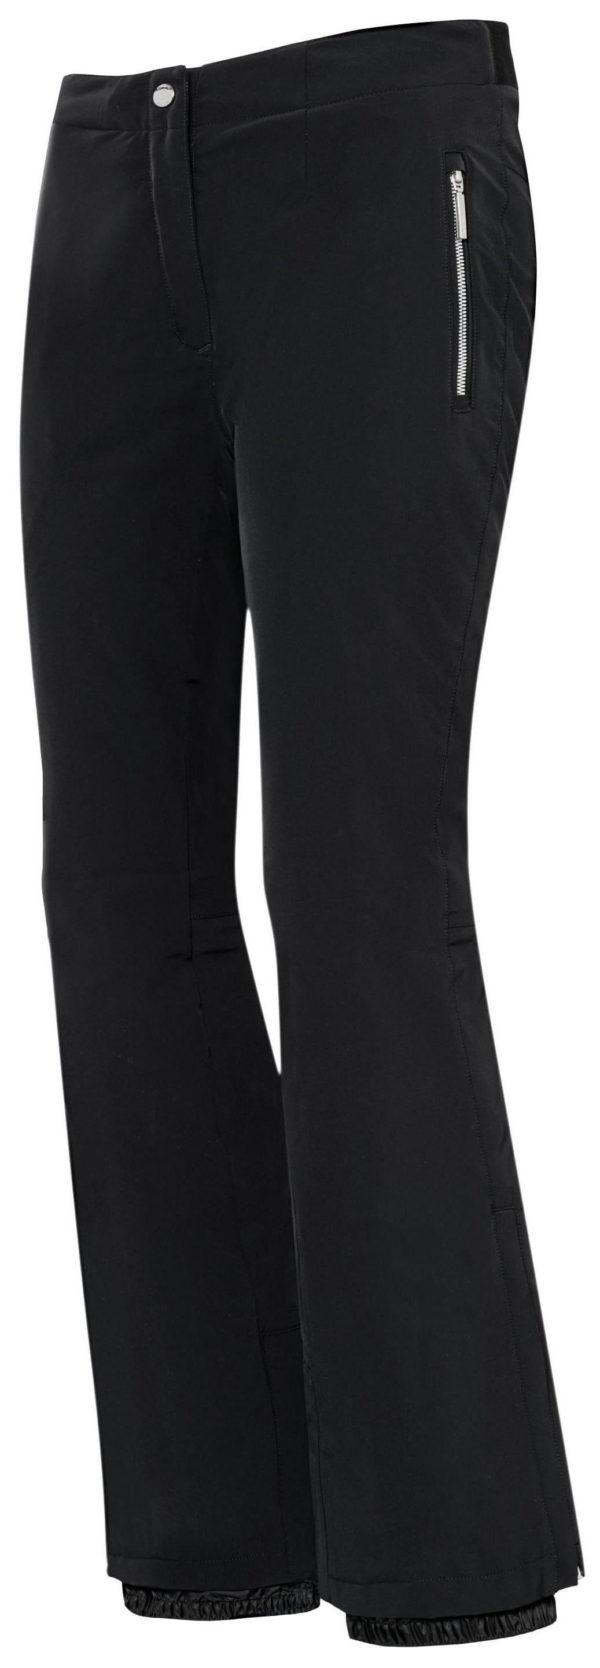 Женские брюки Descente Harriet (стандарт) - фото 1